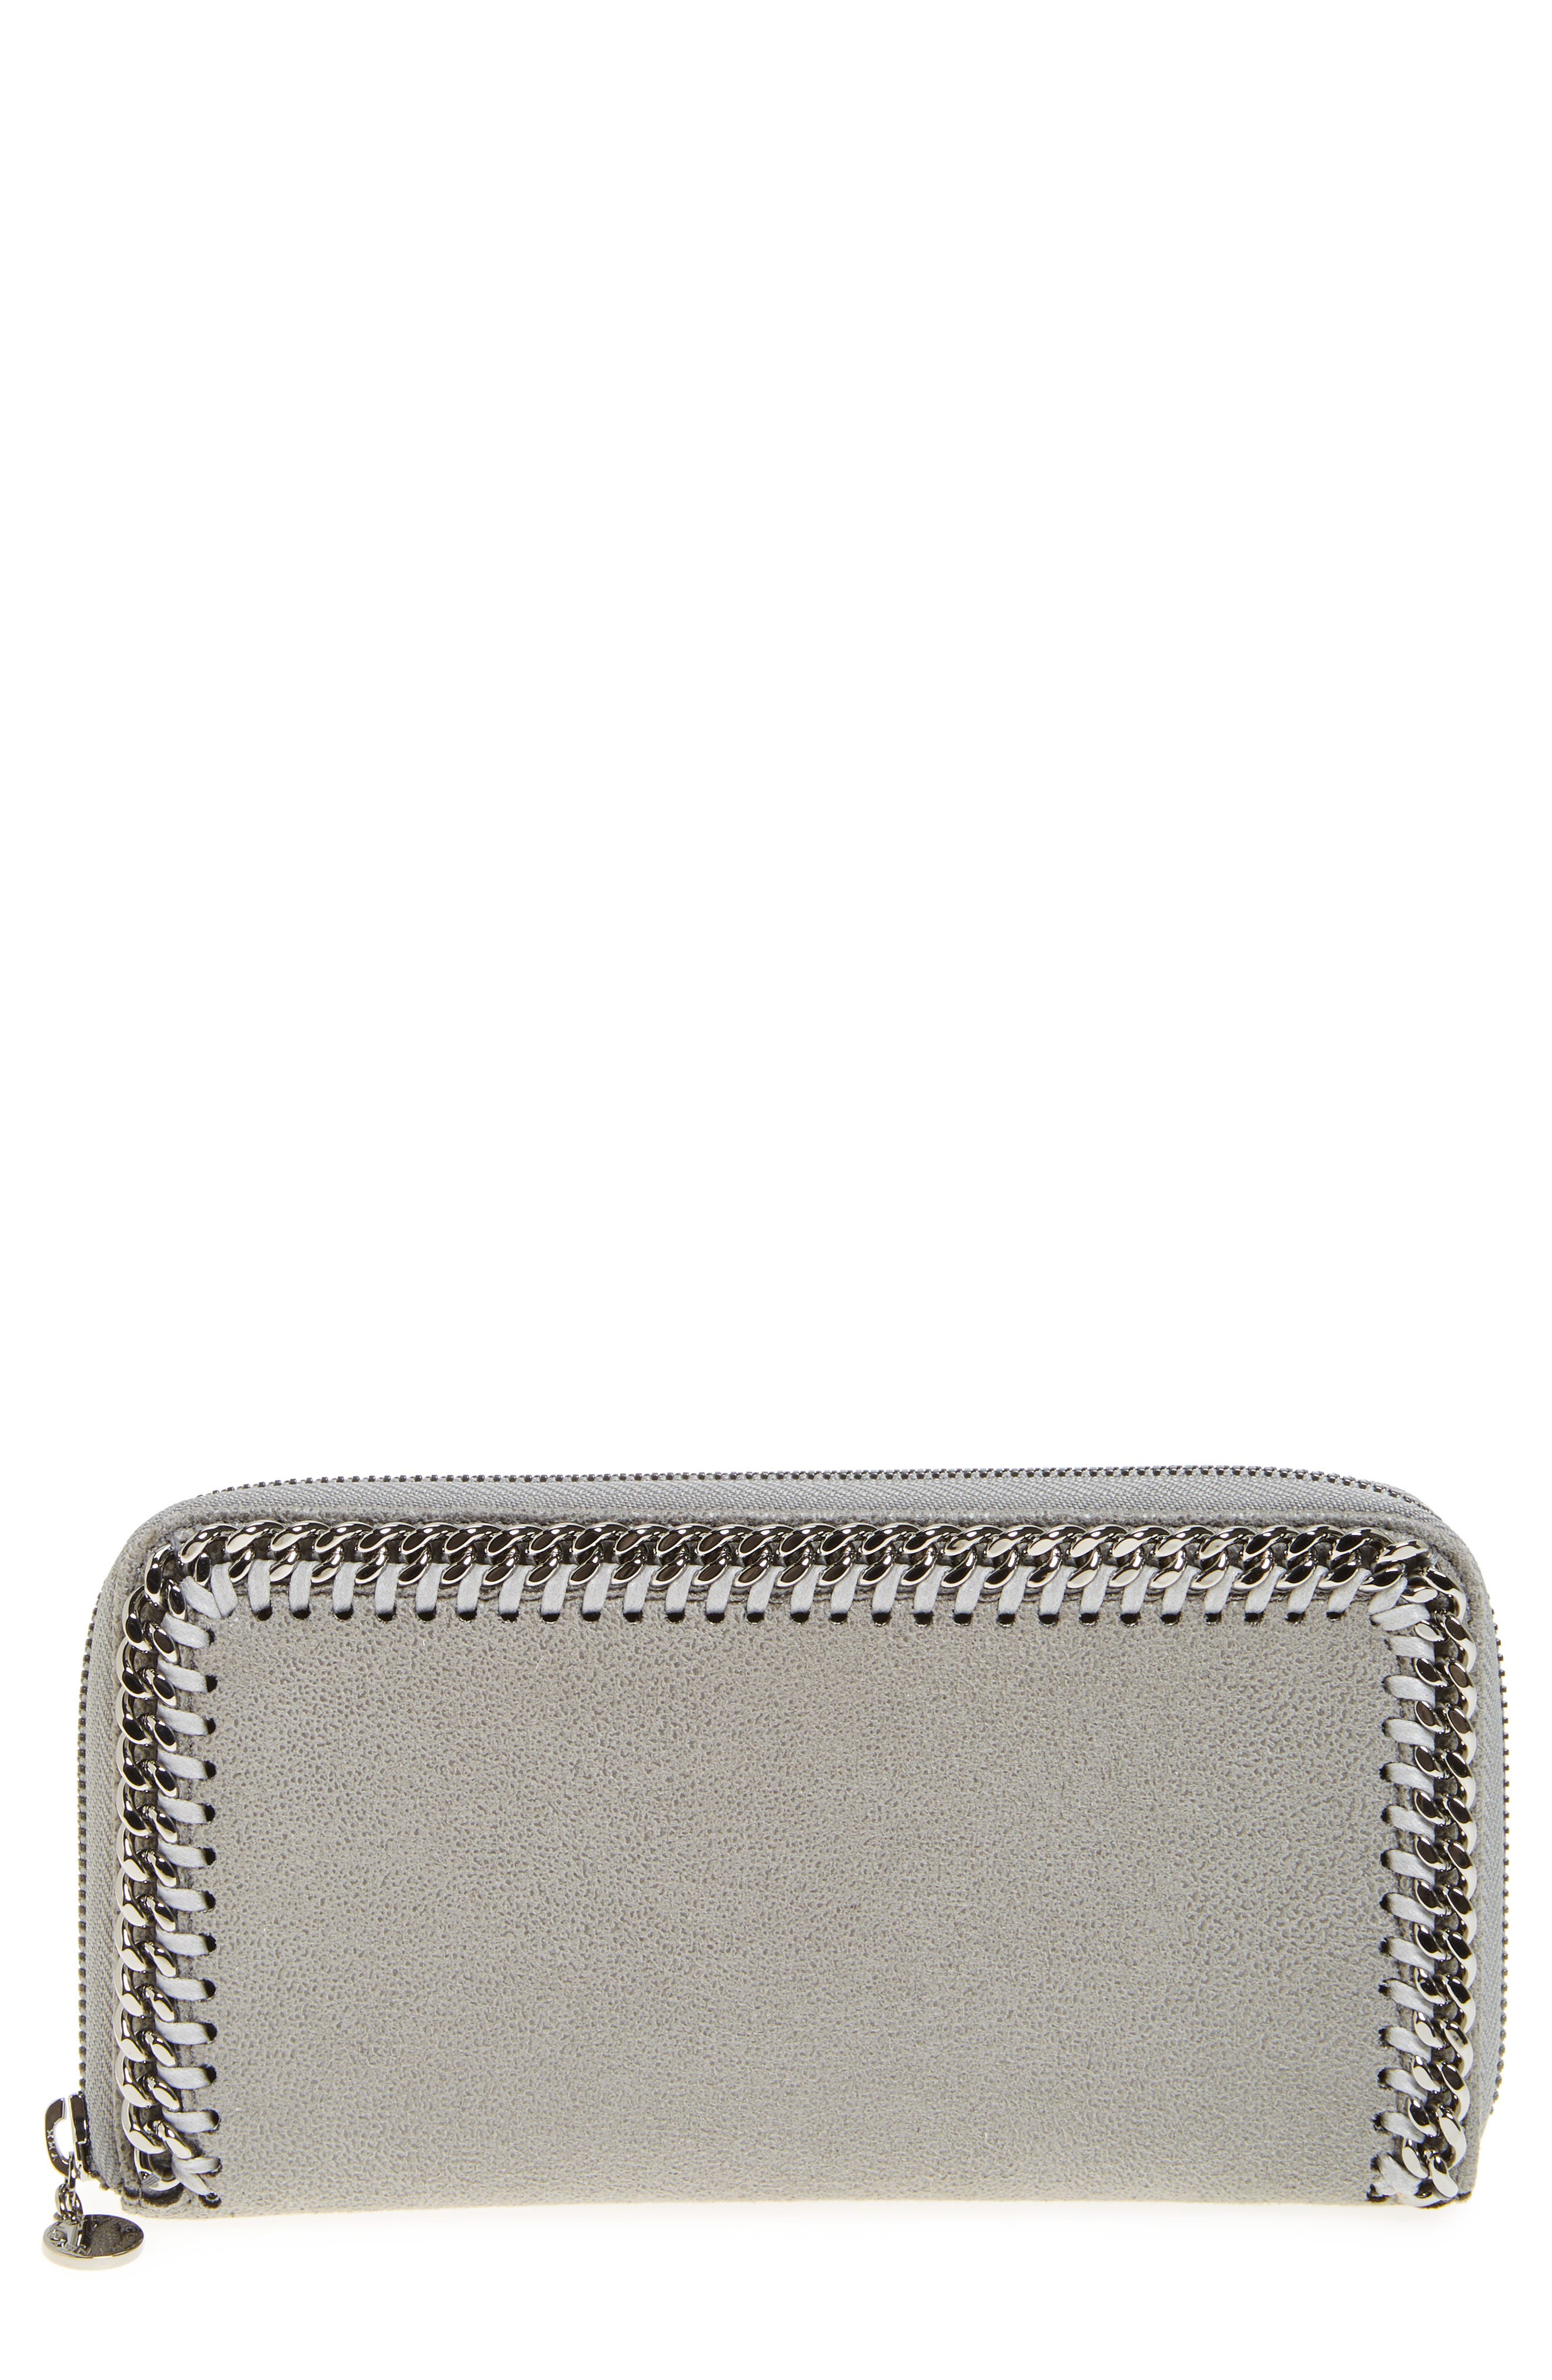 Stella McCartney Falabella Faux Leather Wallet